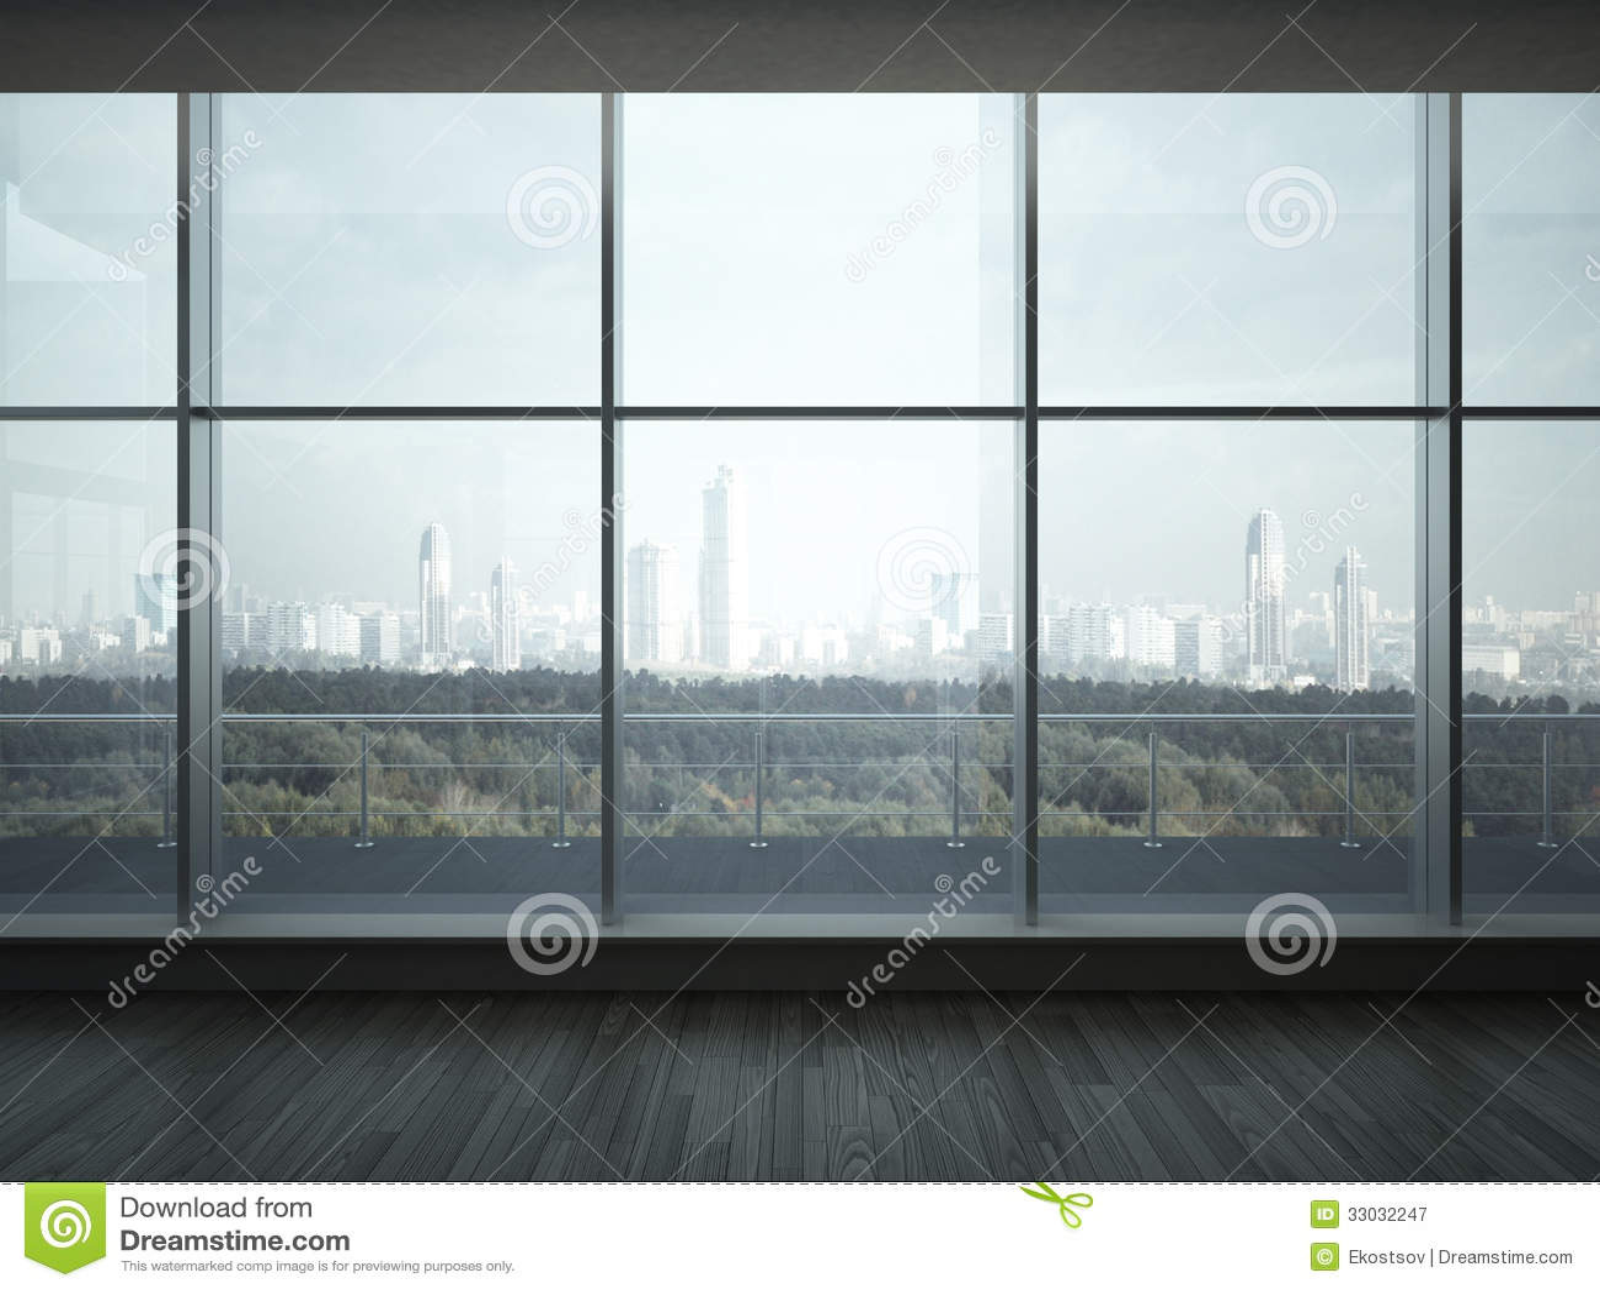 Interior office windows - Interior Office